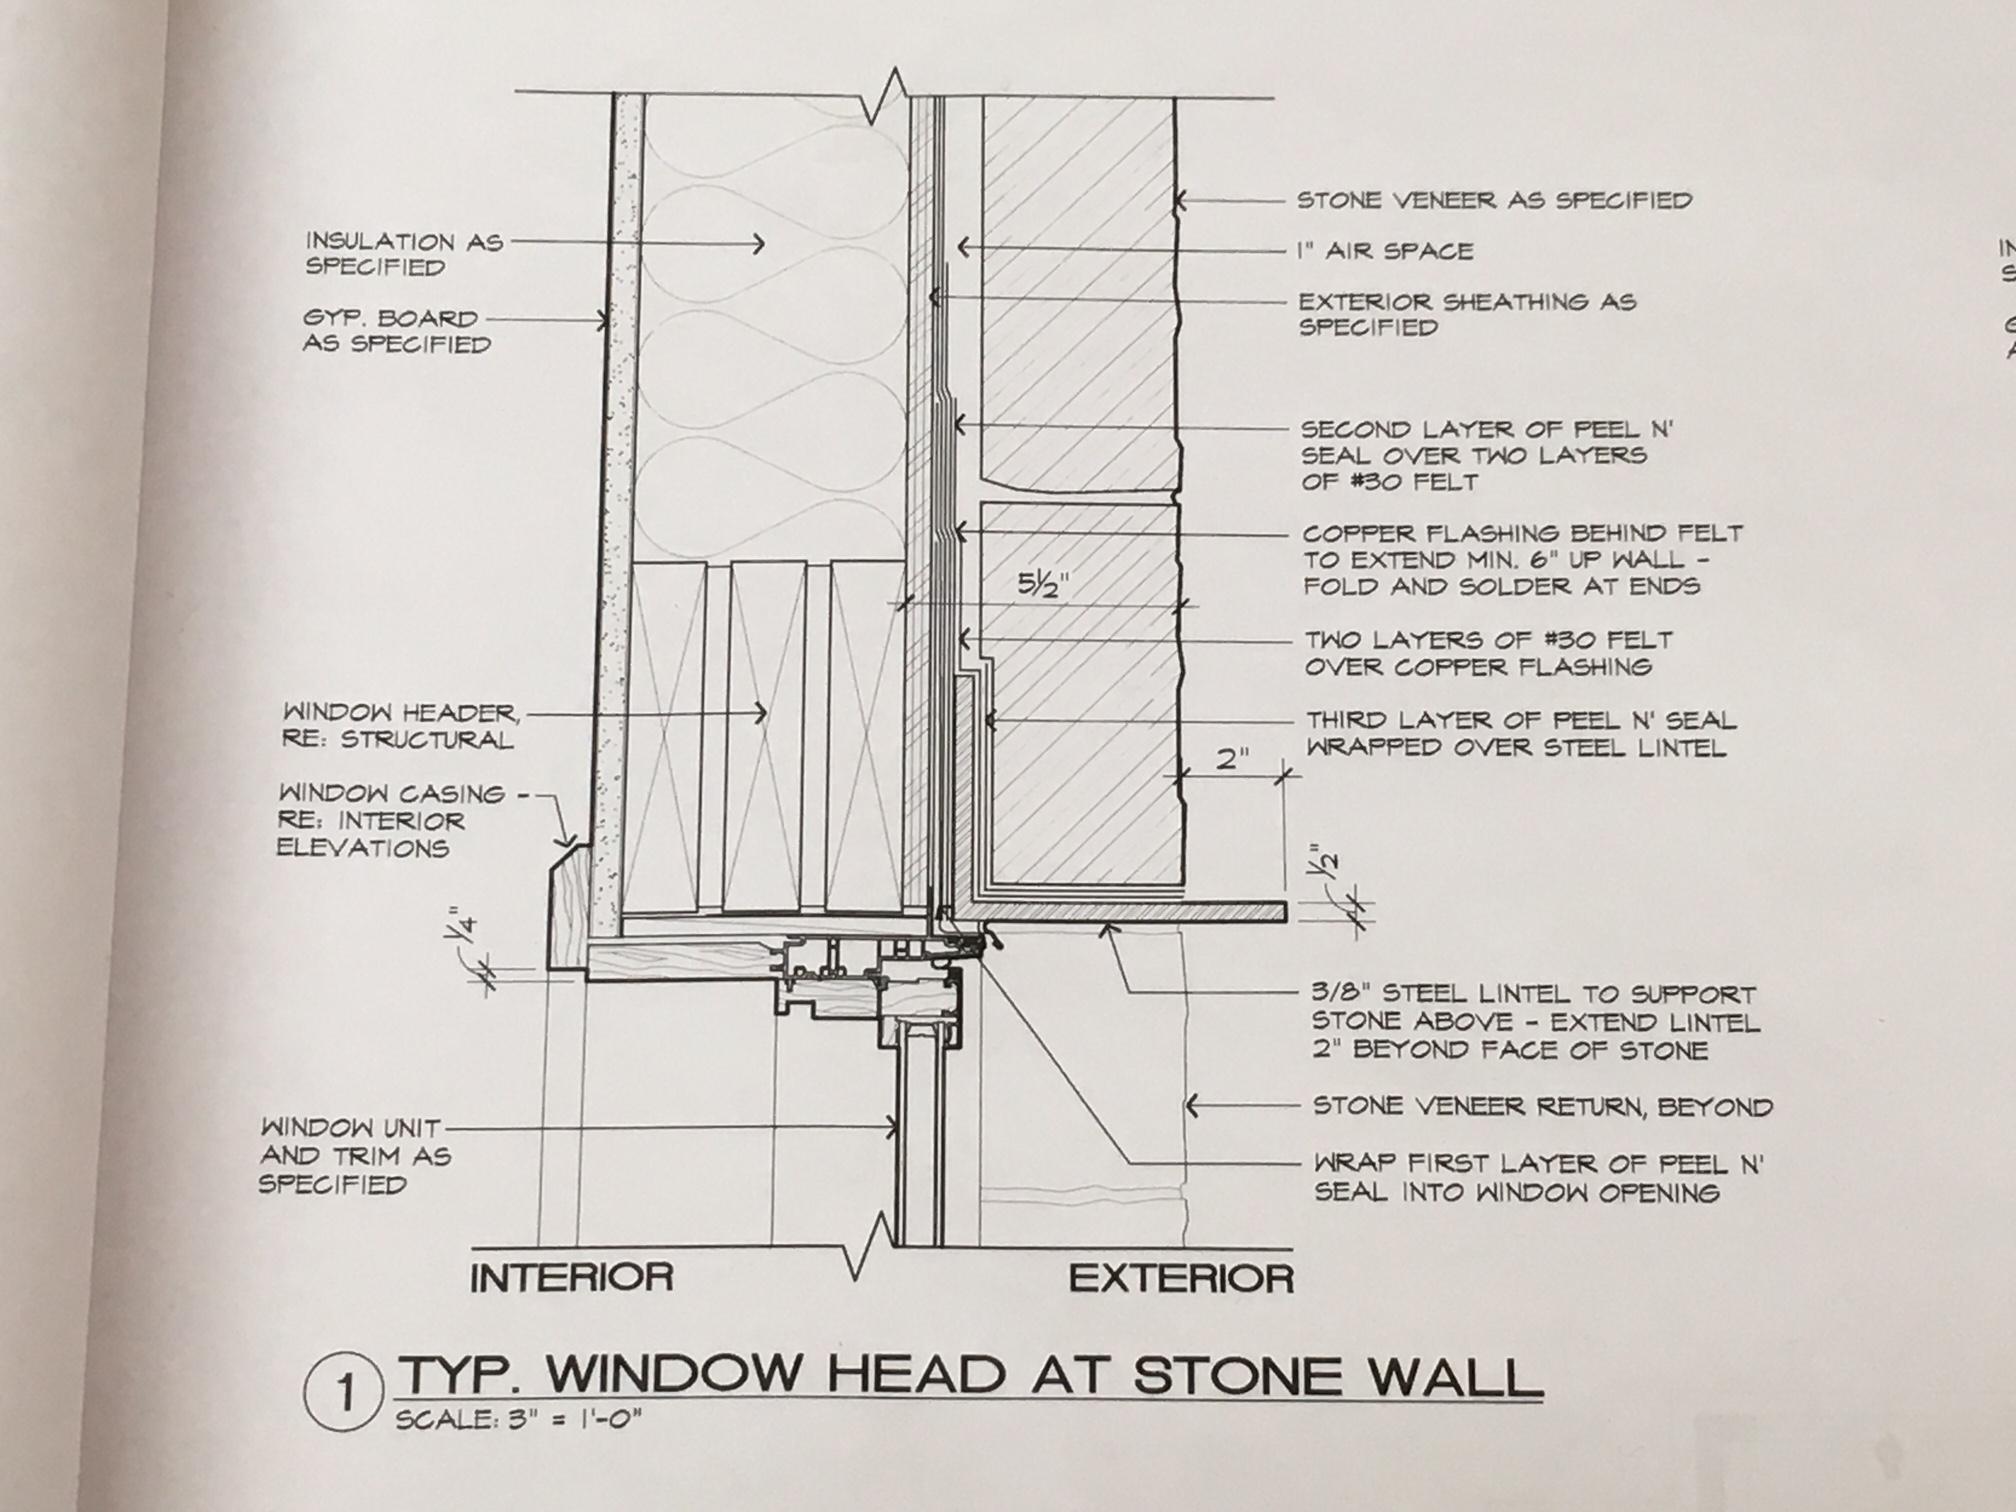 Cutting House Wrap Around A Steel Lintel Windows Siding